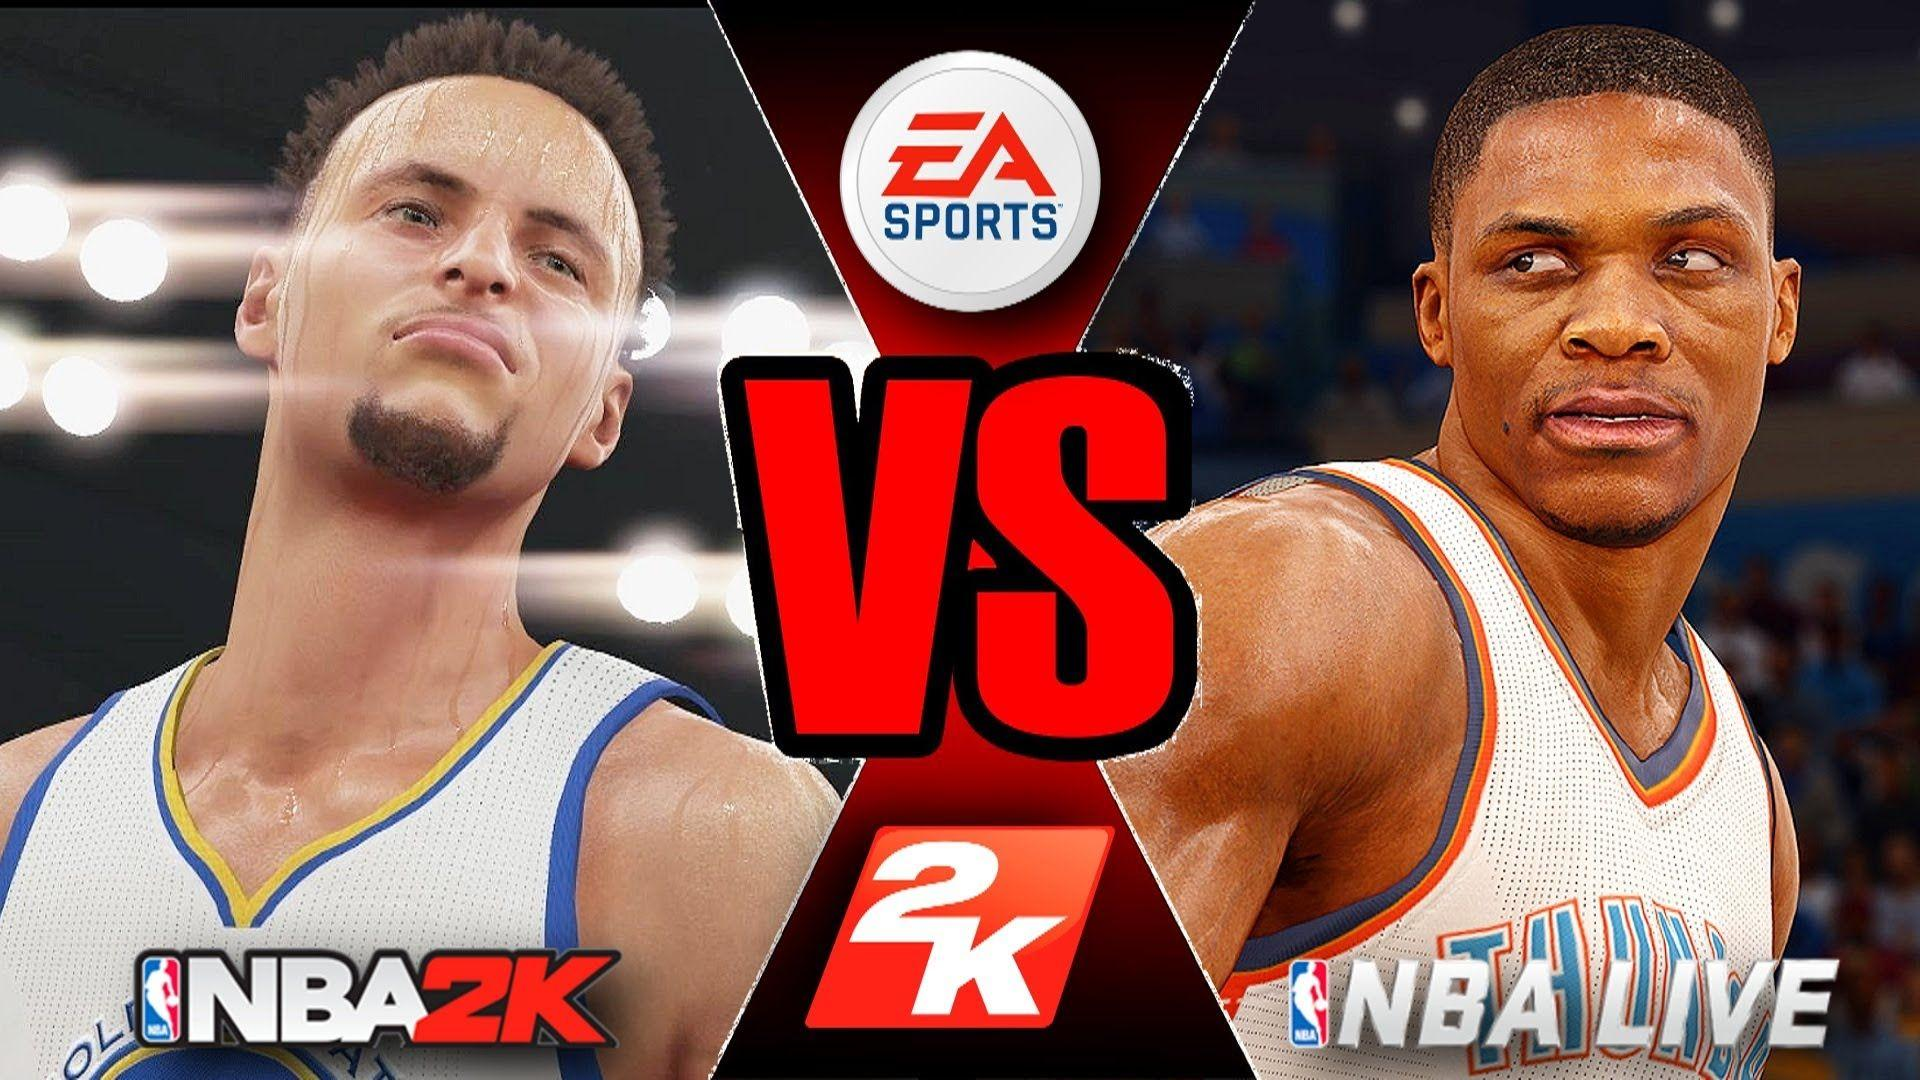 NBA 2K18 VS NBA LIVE 18! -COMPARISON (OPINIONATED) - YouTube